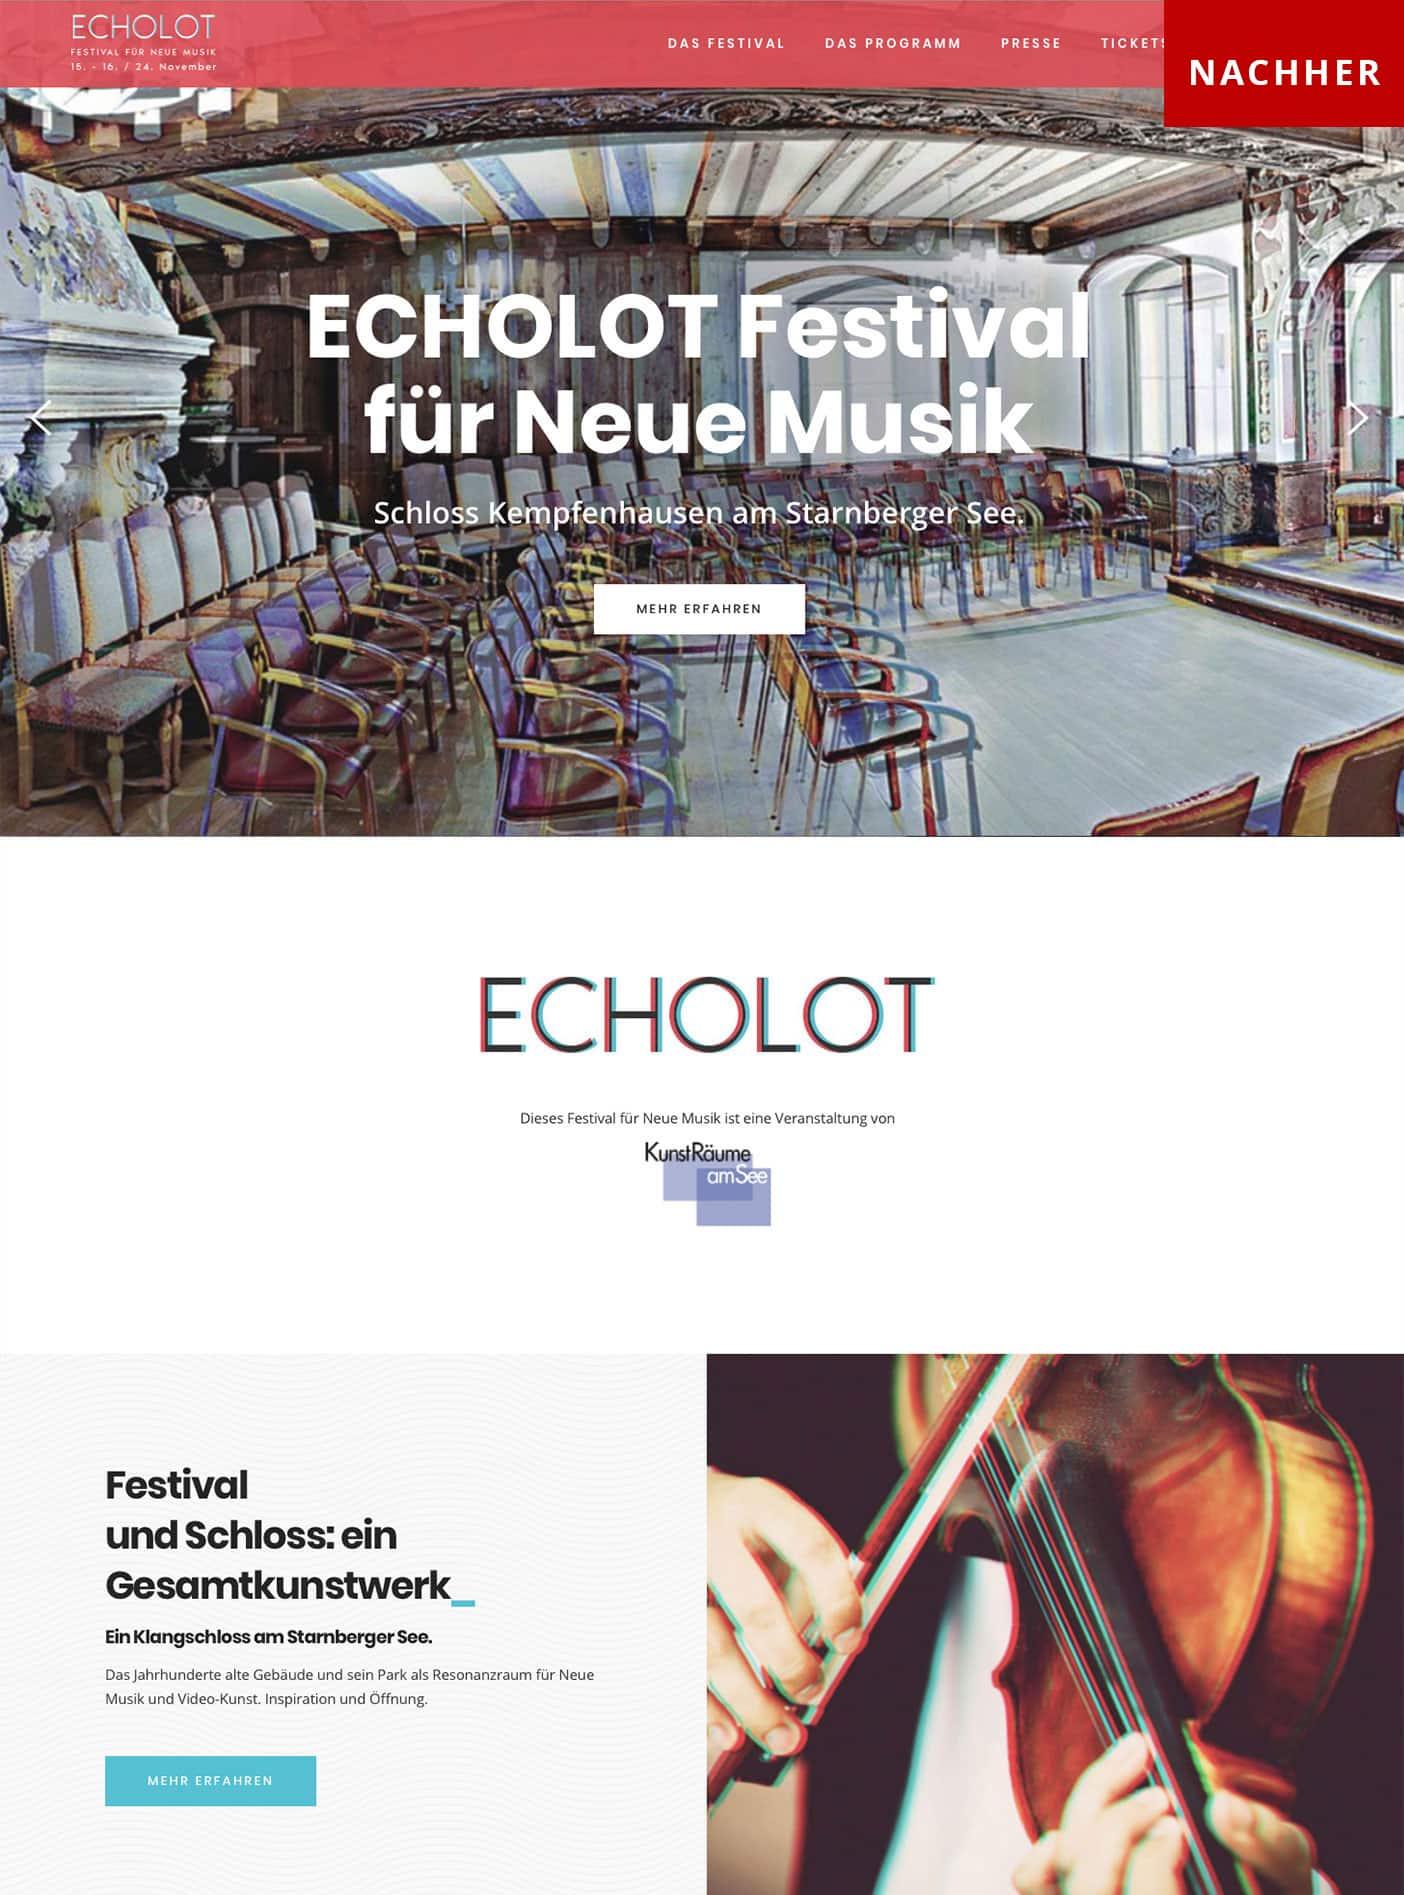 new-website-nachher